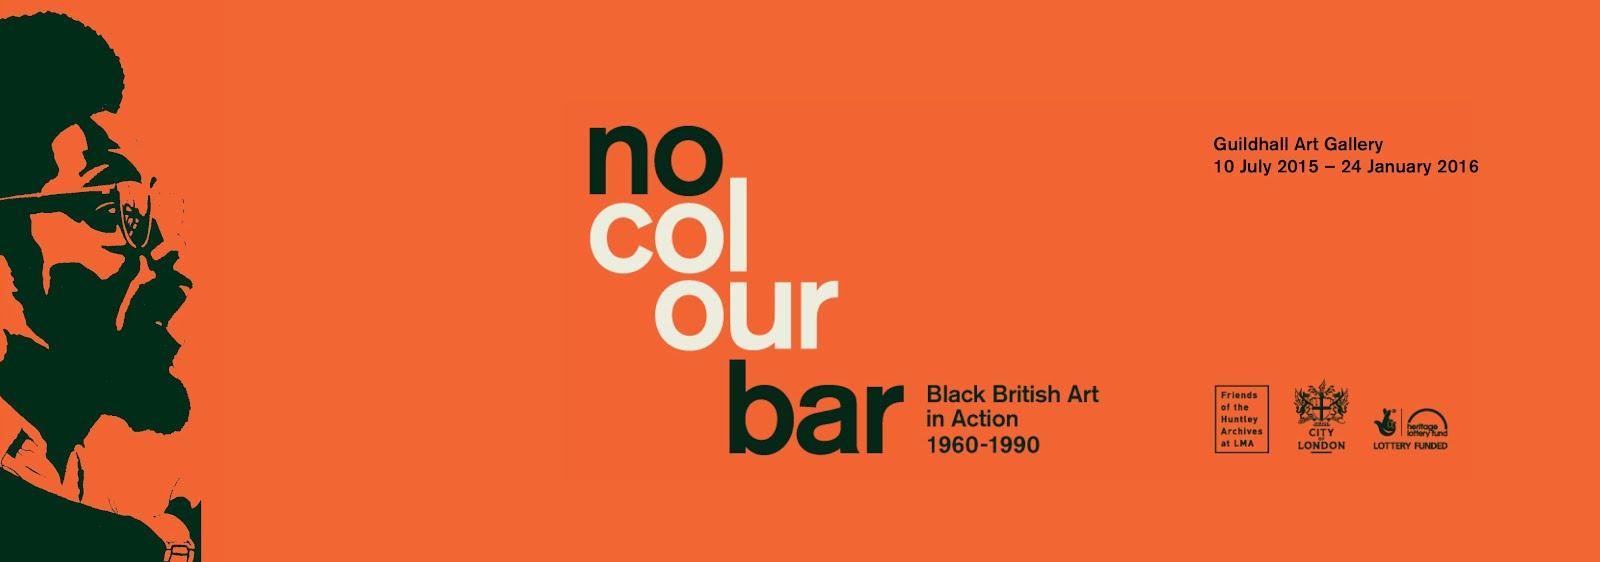 No Colour Bar: Black British Art in Action 1960 - 1990